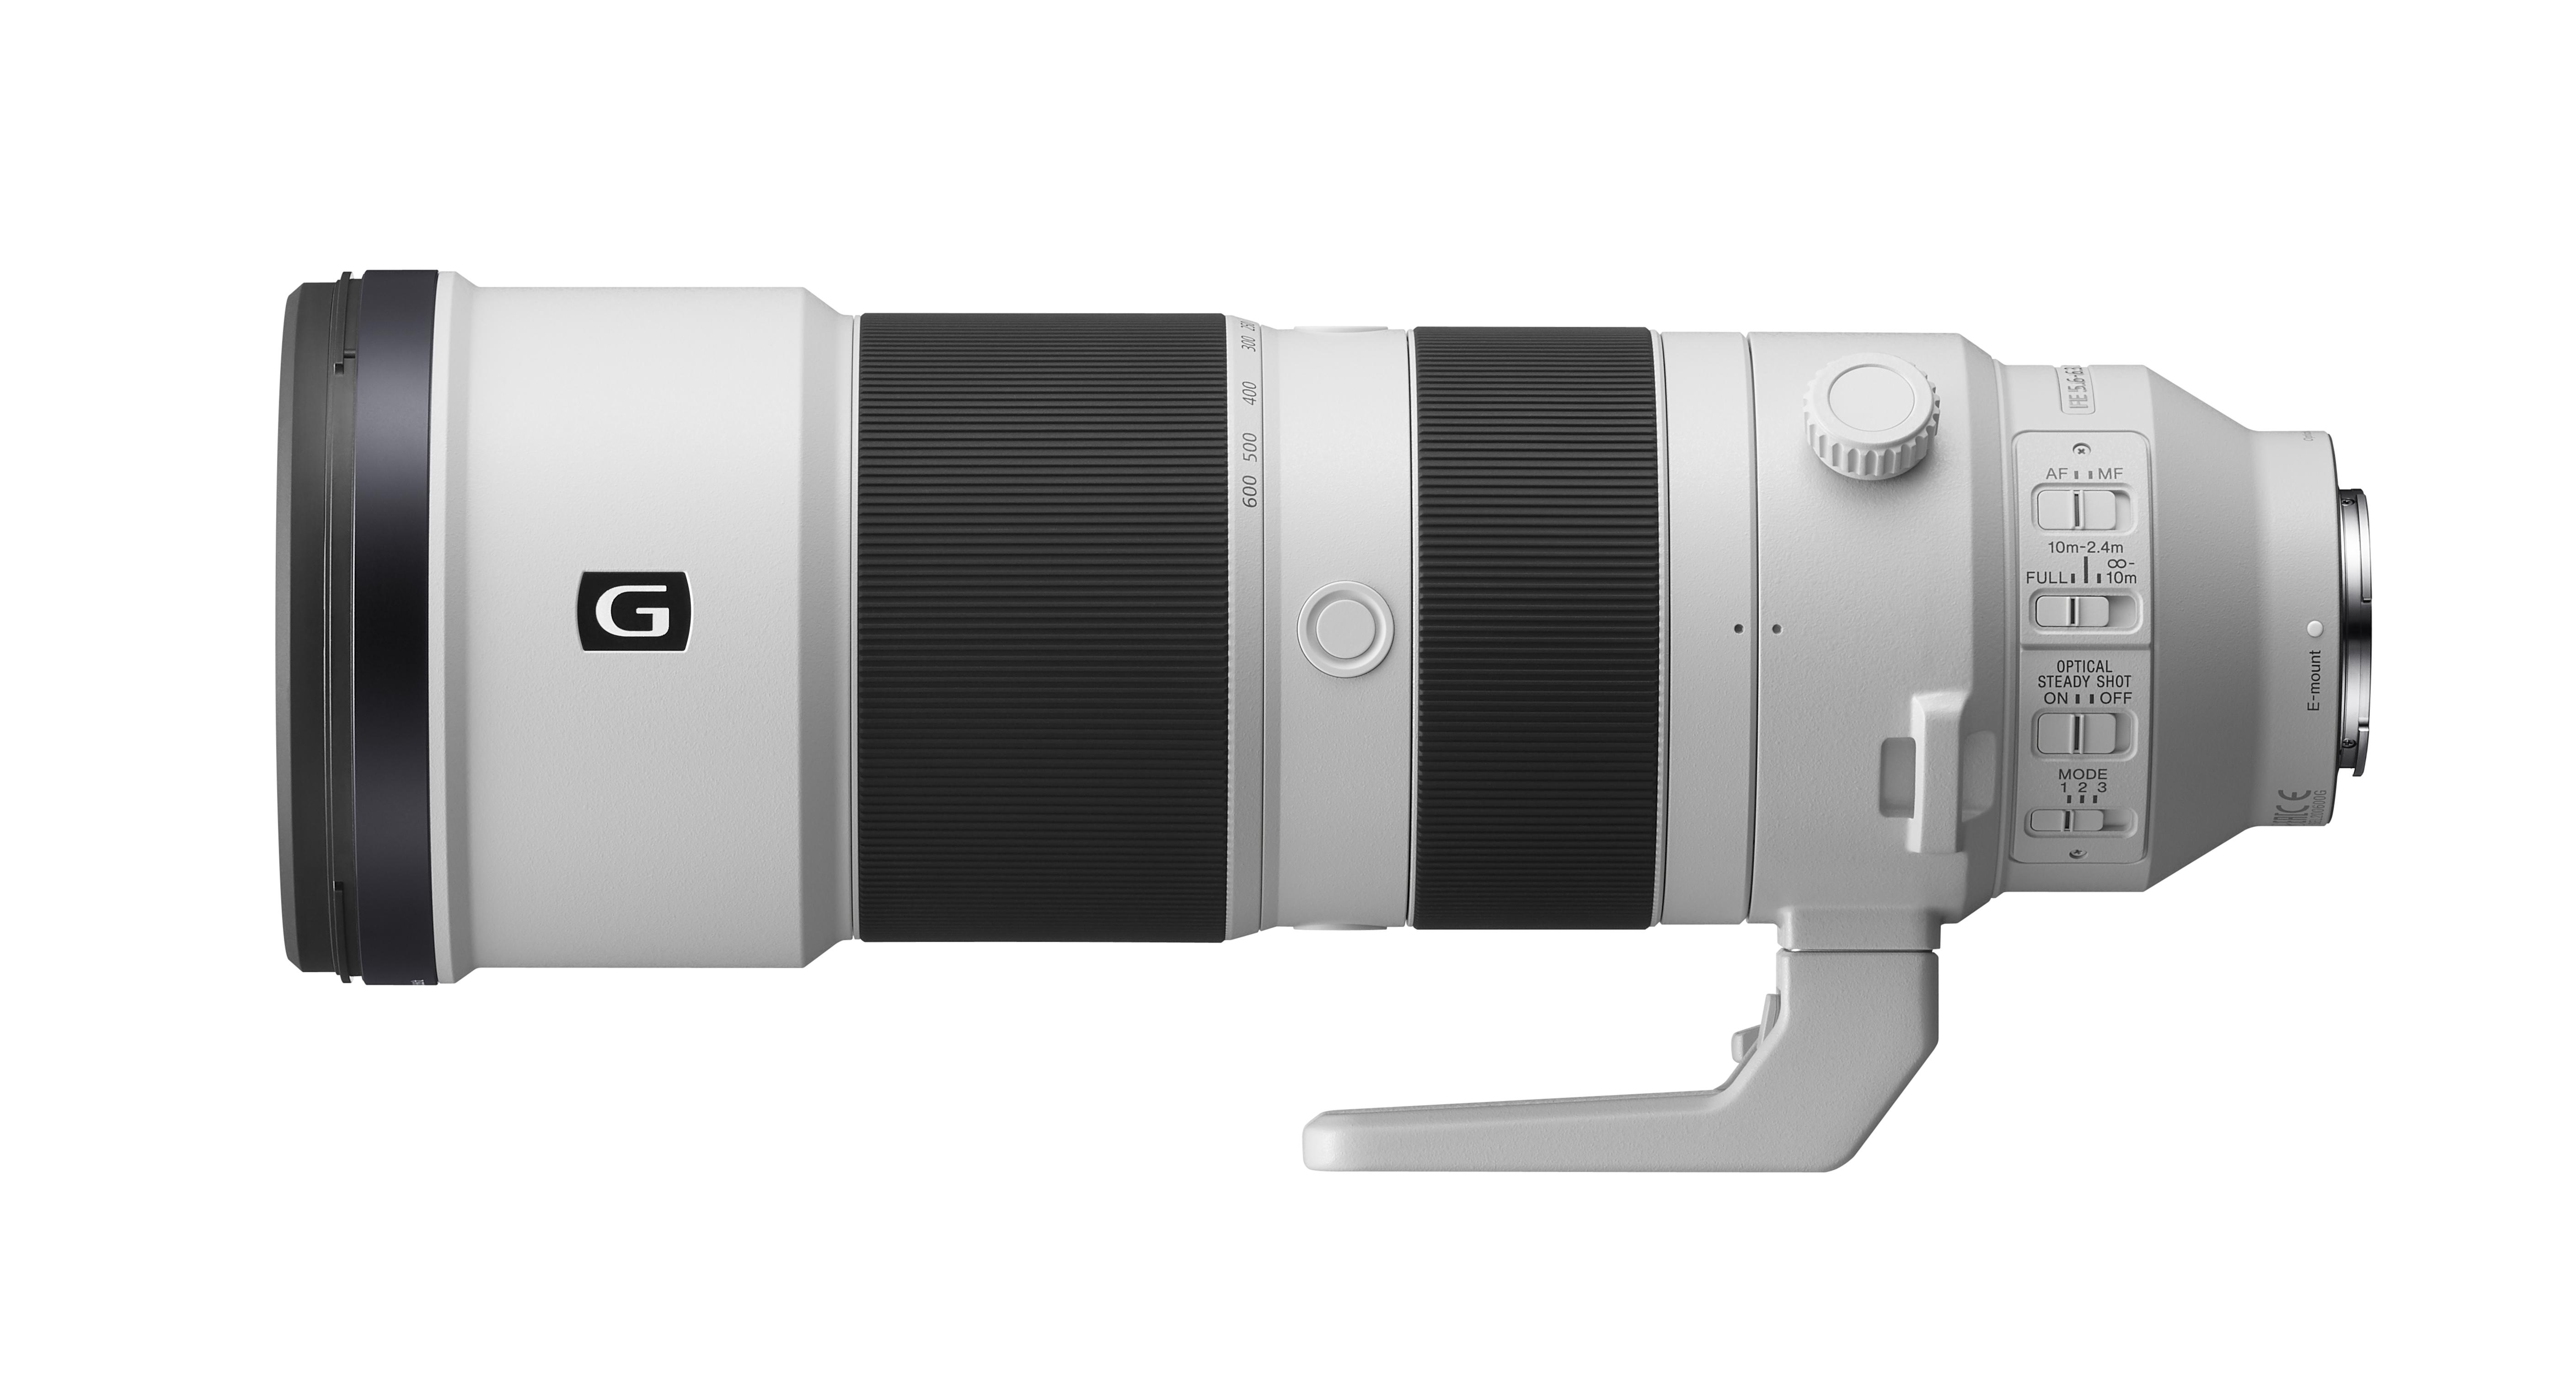 SEL200600G-Image-2